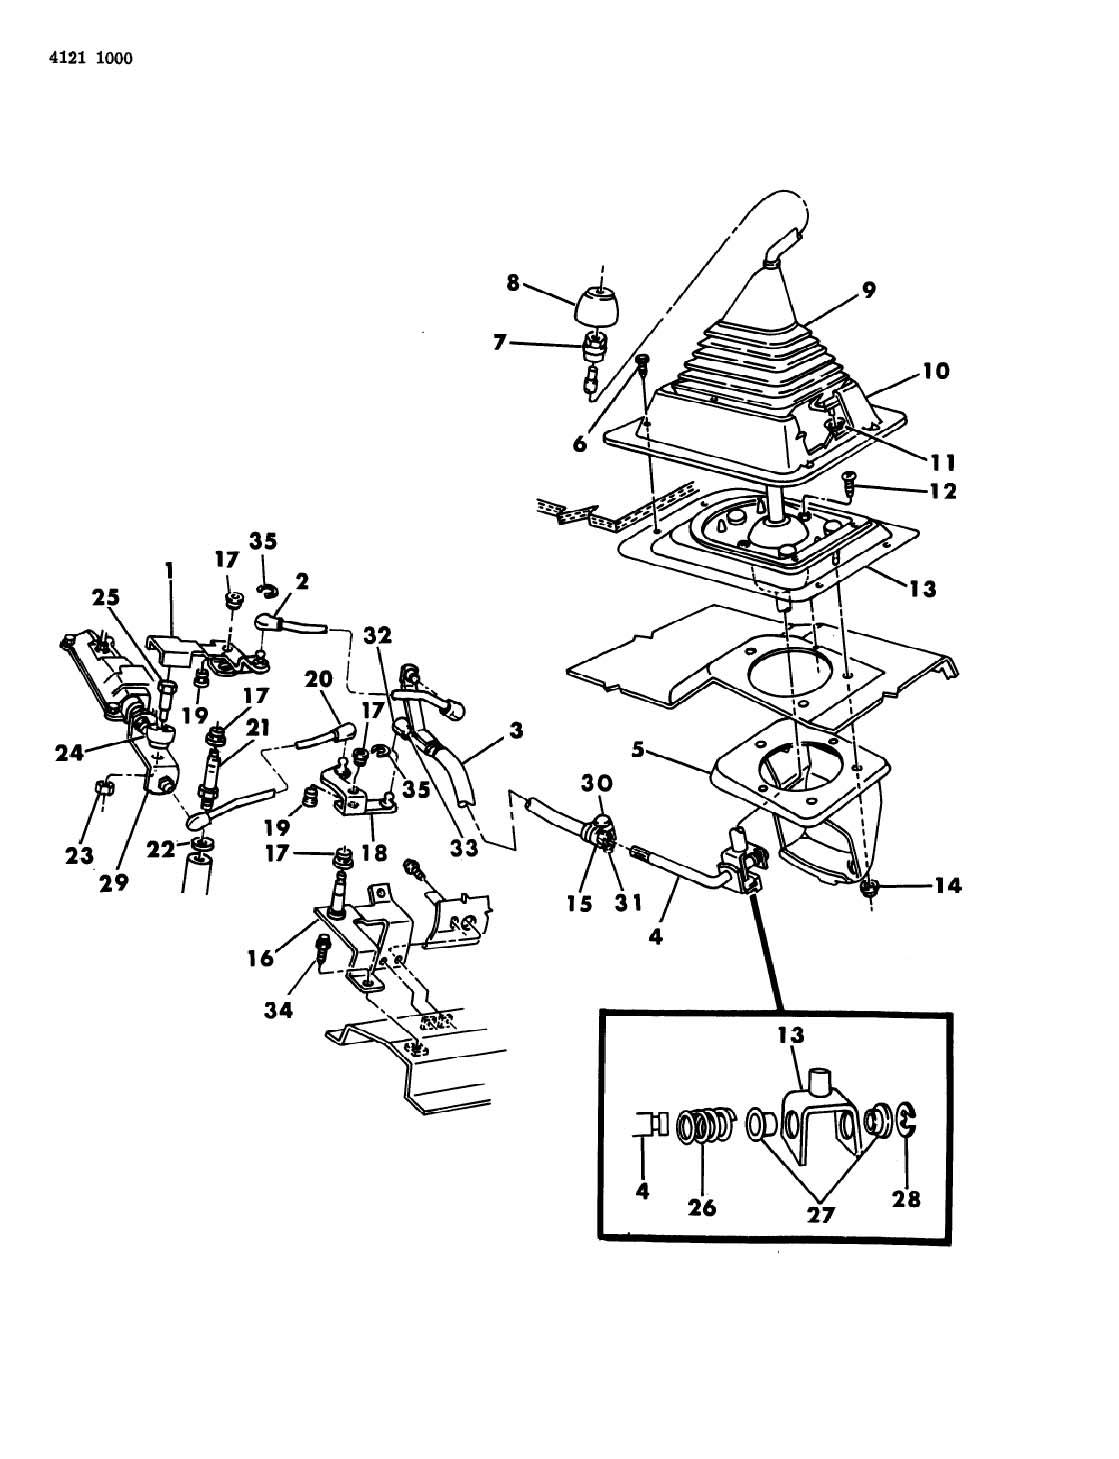 Jacobs brake wiring diagram within diagram wiring and engine